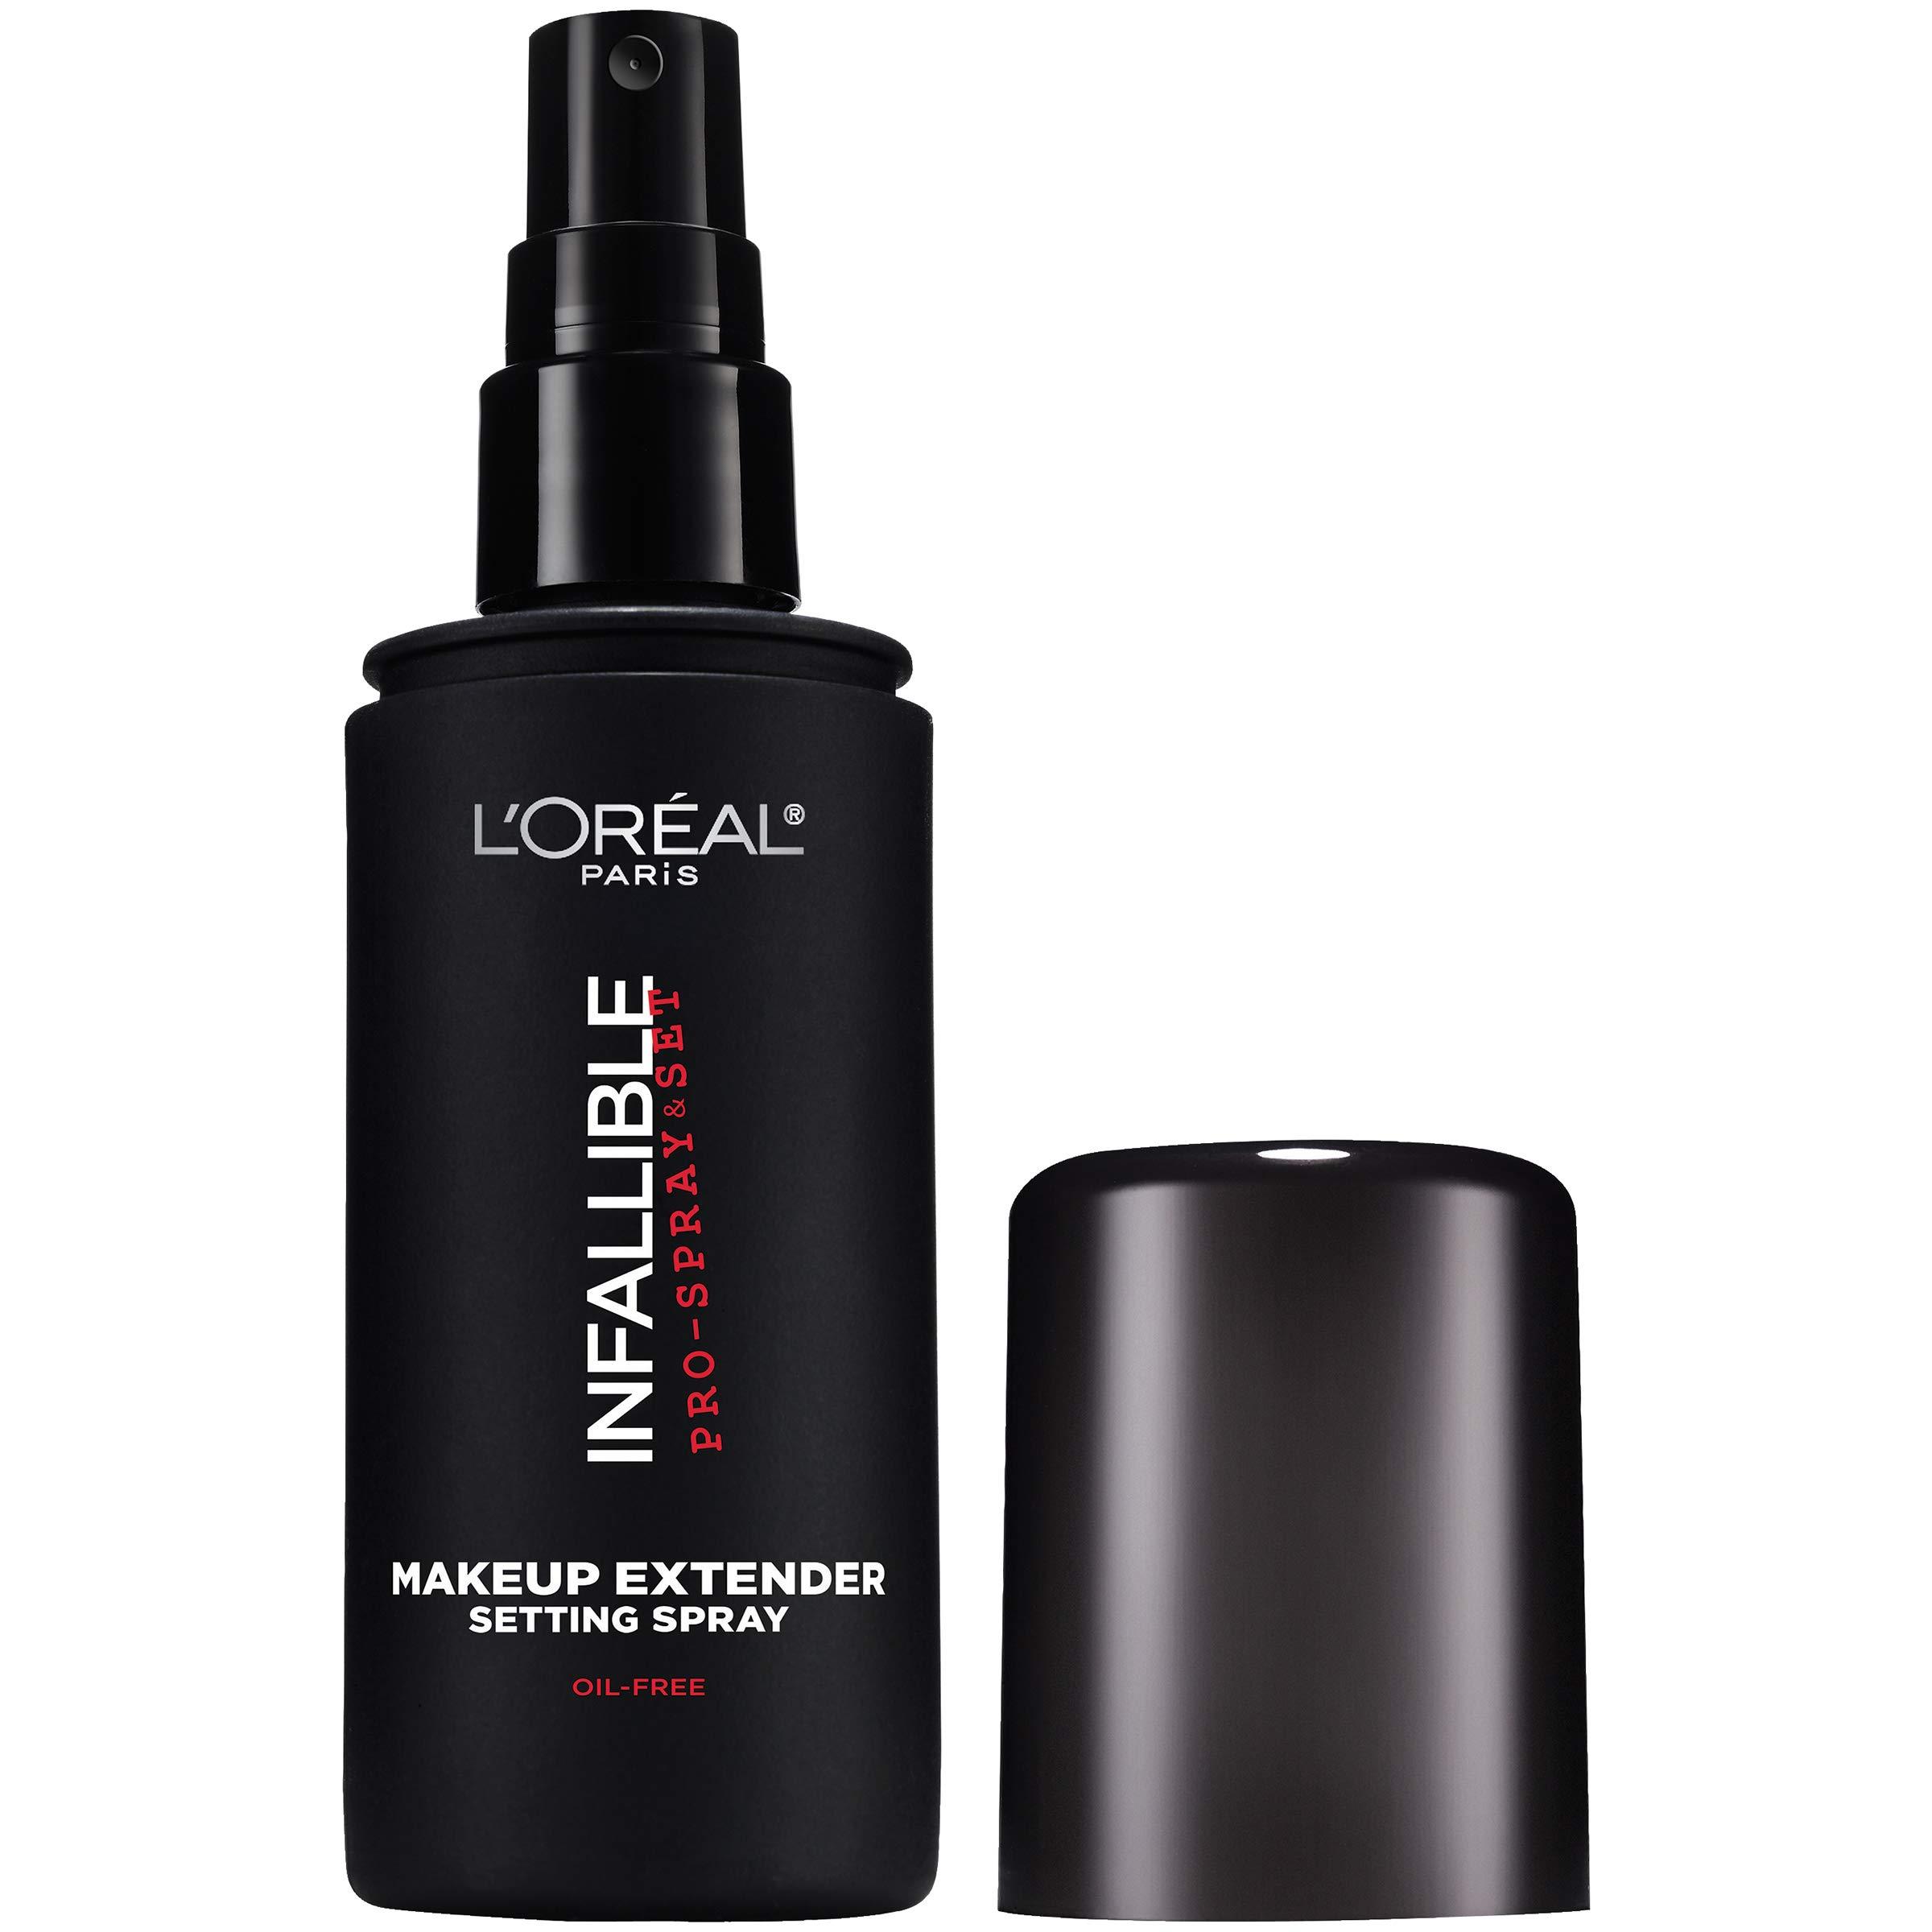 L'Oreal Paris Makeup Infallible Pro-Spray & Set Makeup Extender Setting Spray, 3.4 fl. Oz.